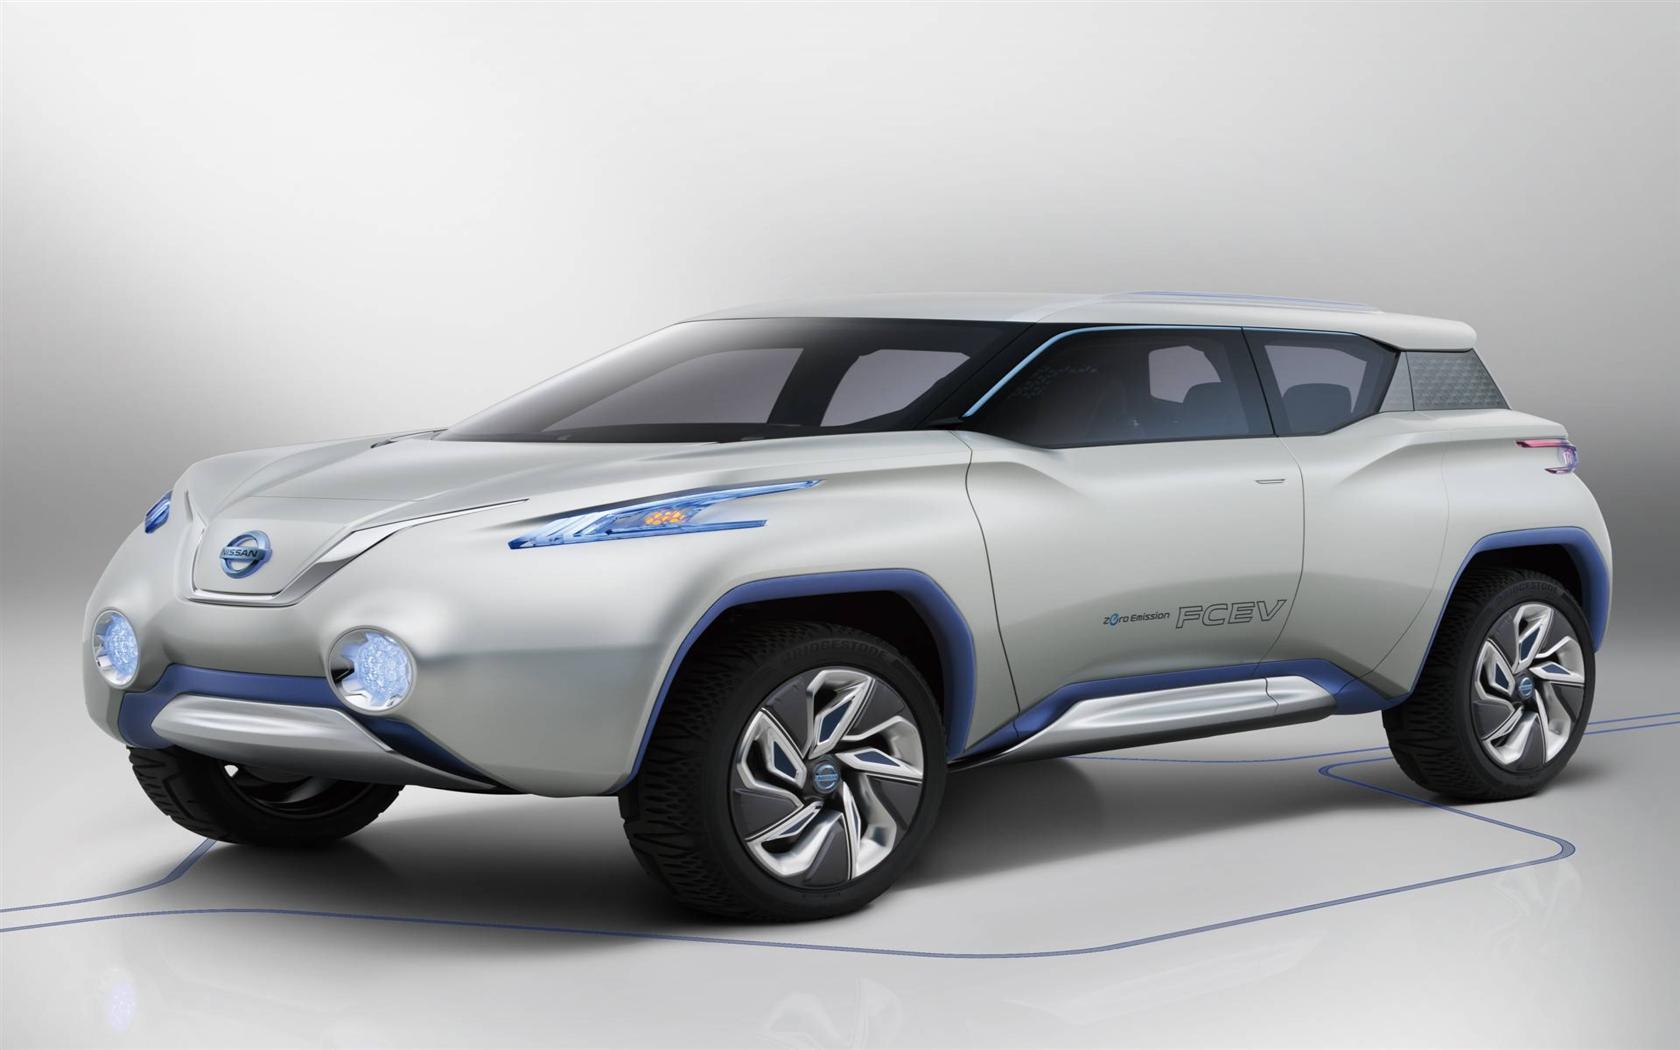 2013 Nissan Terra Suv Concept Image Https Www